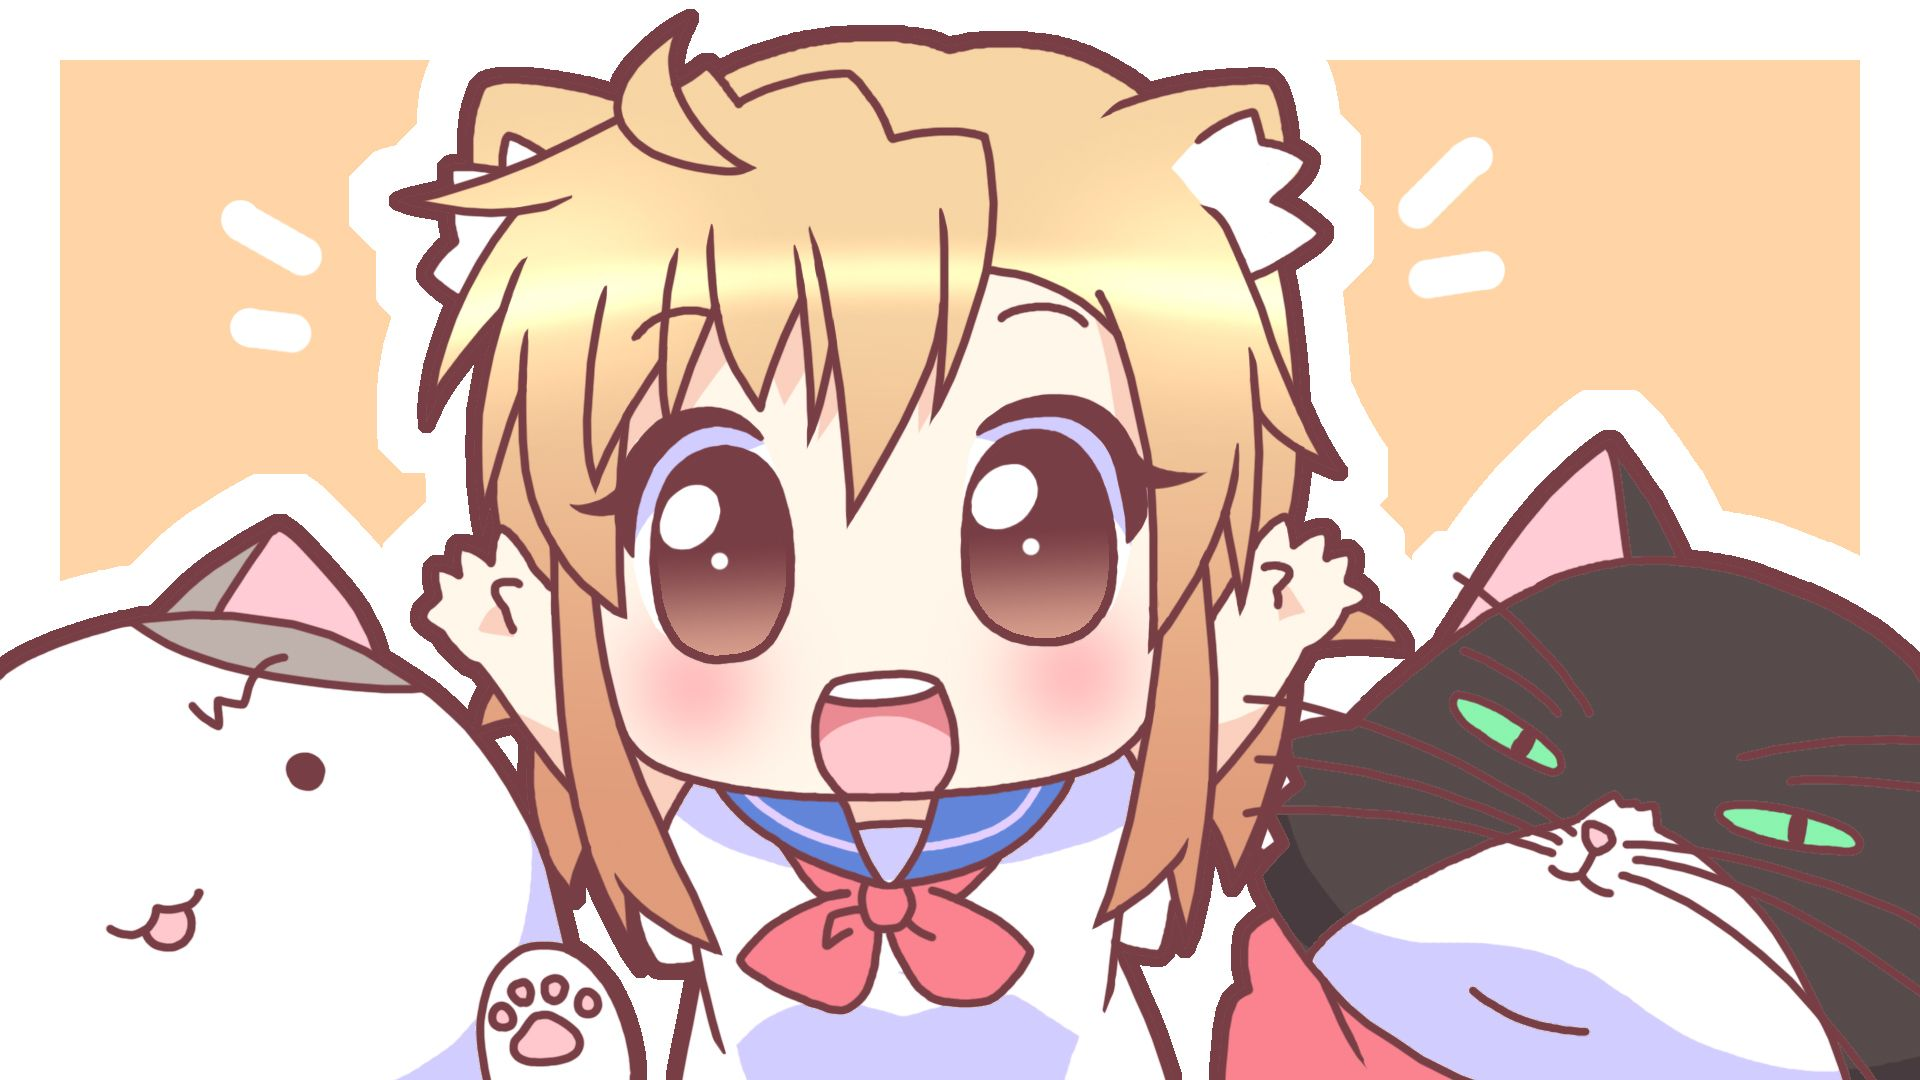 картинки чиби аниме: